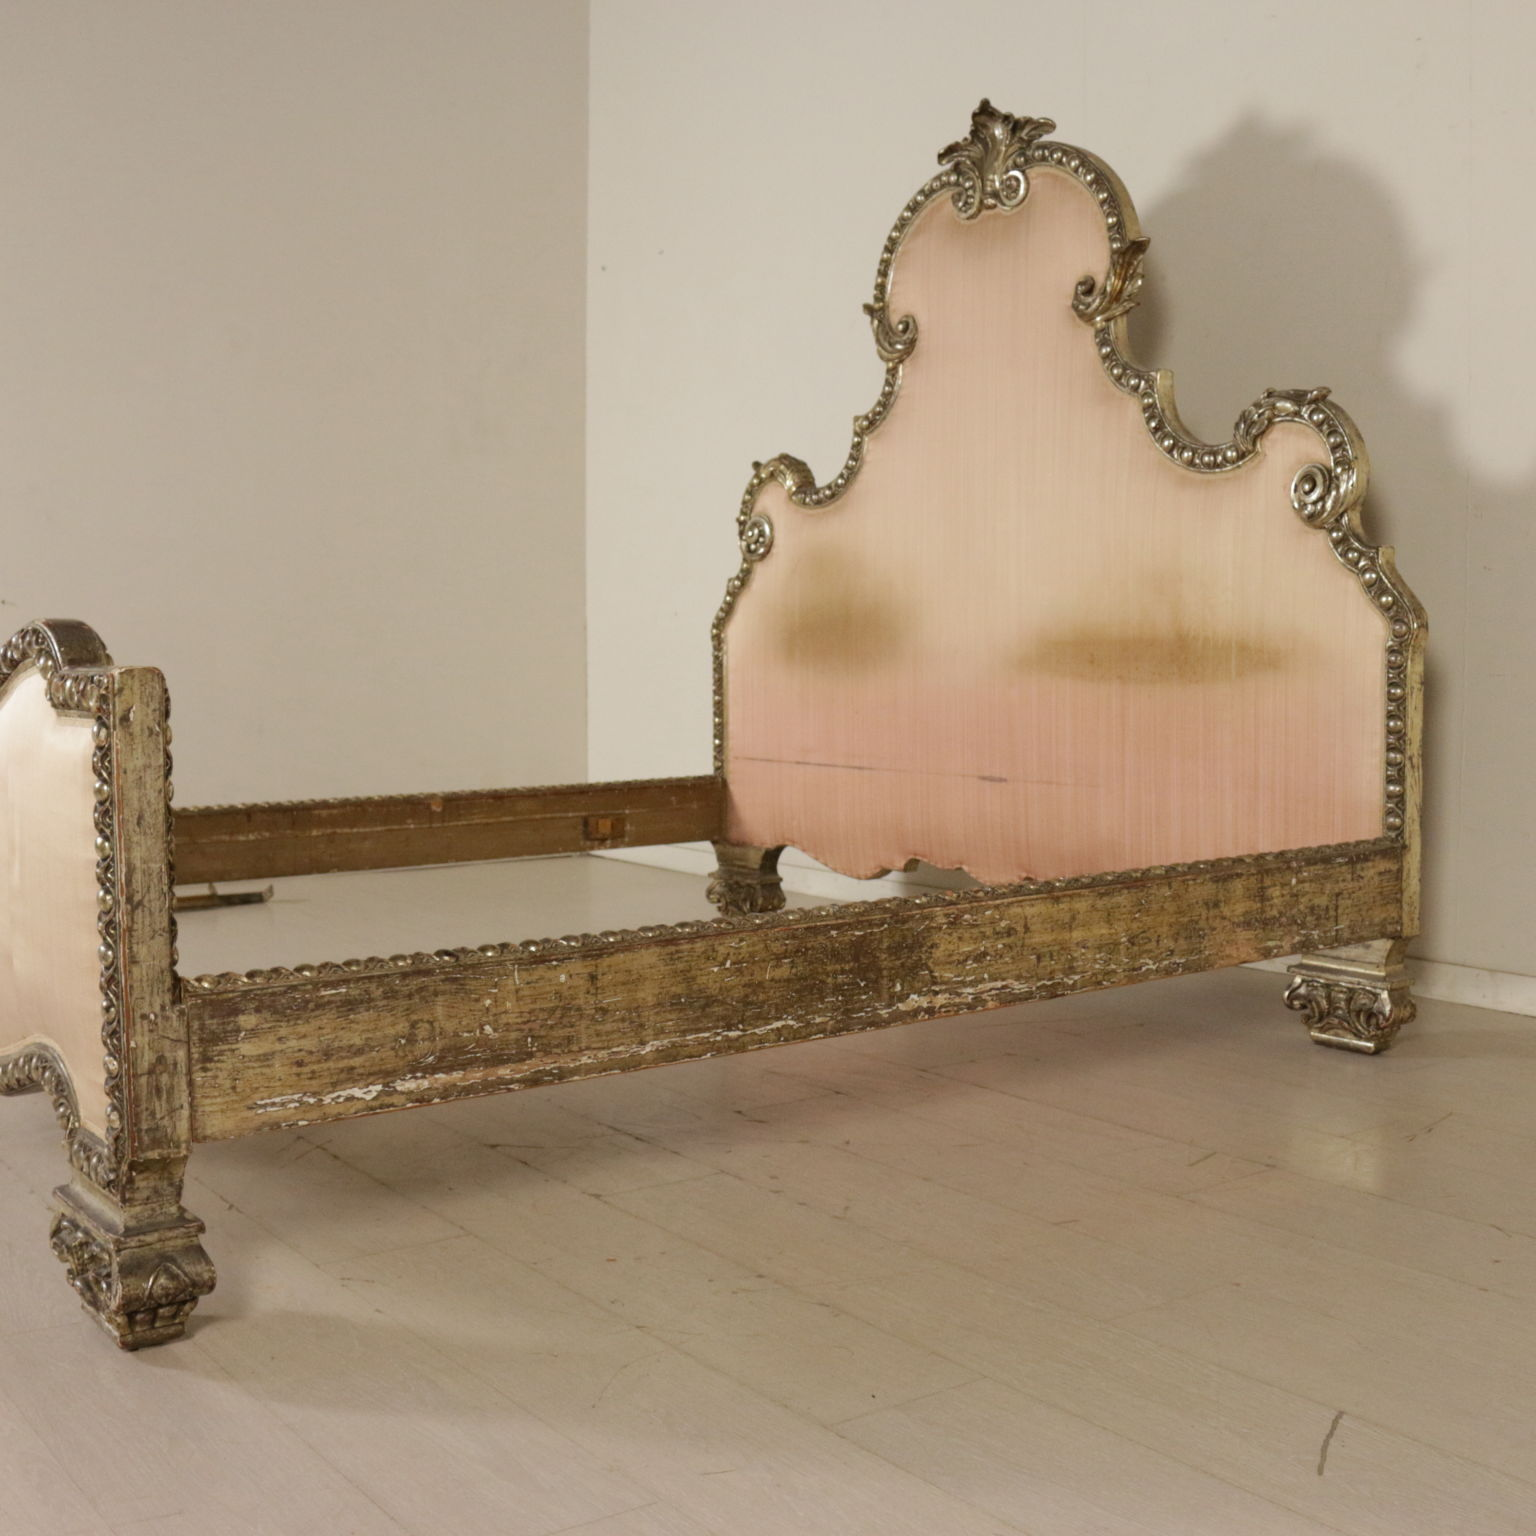 De oro de la cama en la Meca - Muebles de estilo - Bottega del 900 ...